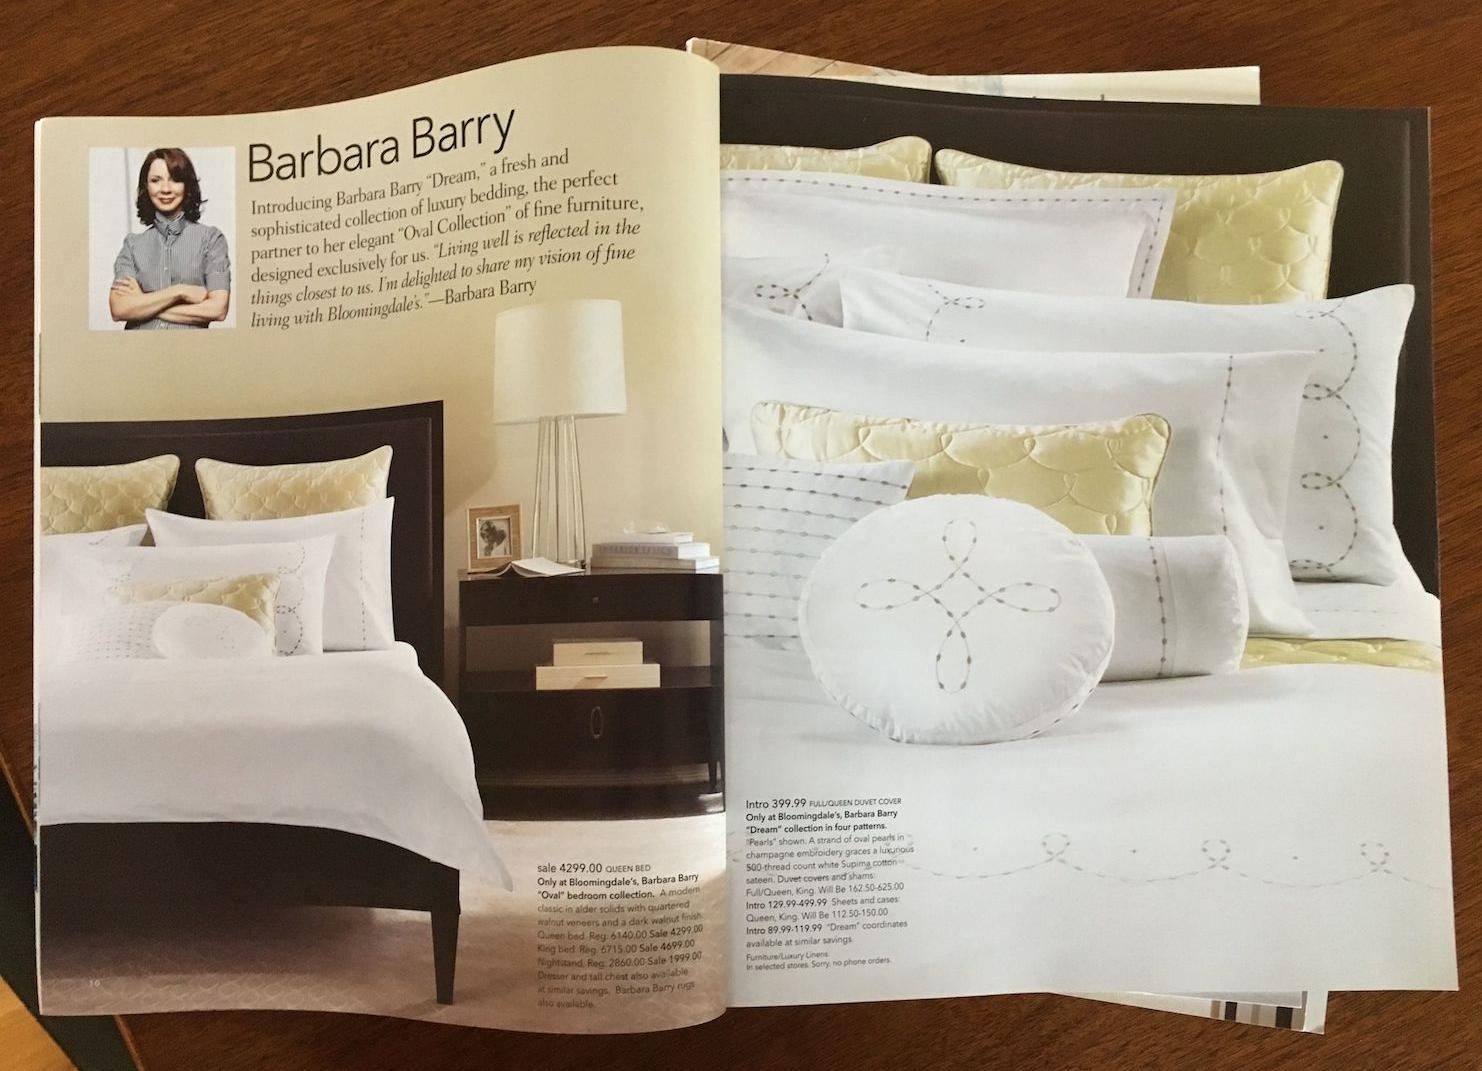 Elle Decor Magazine - Barbara Barry Home